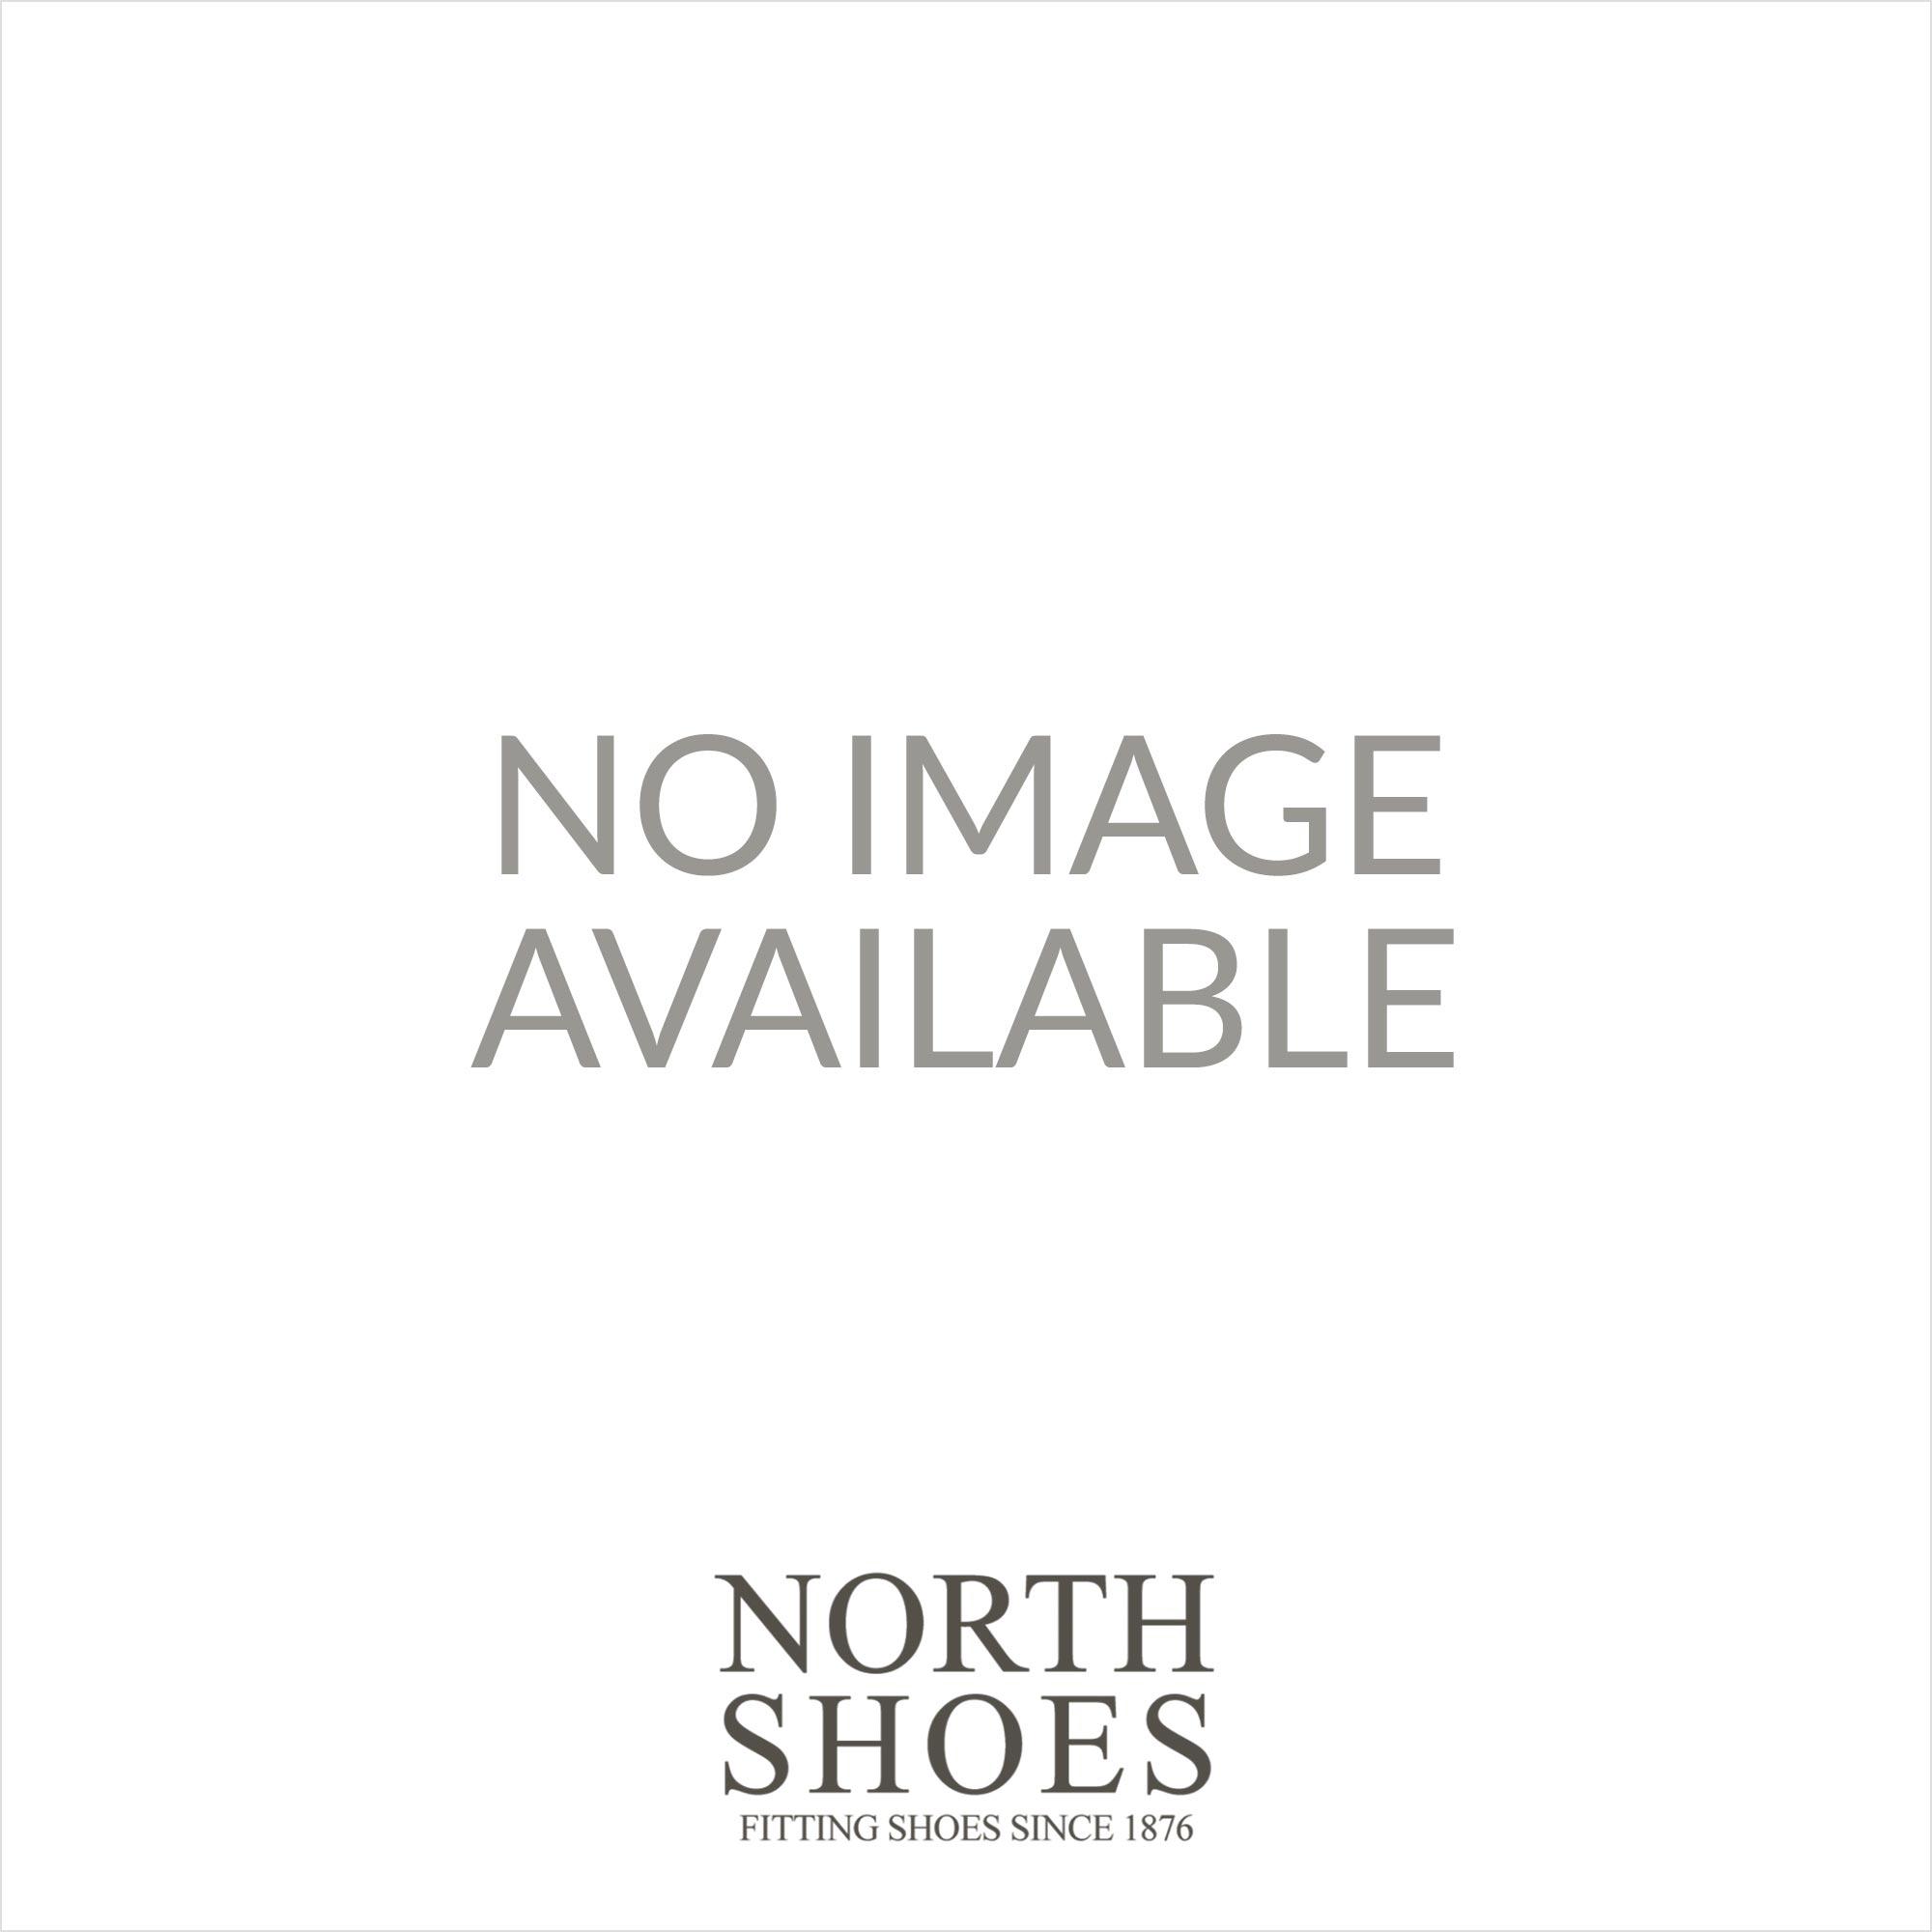 9598344f5e5f Clarks Sillian Tana Textile Boots in Black Christmas Holiday